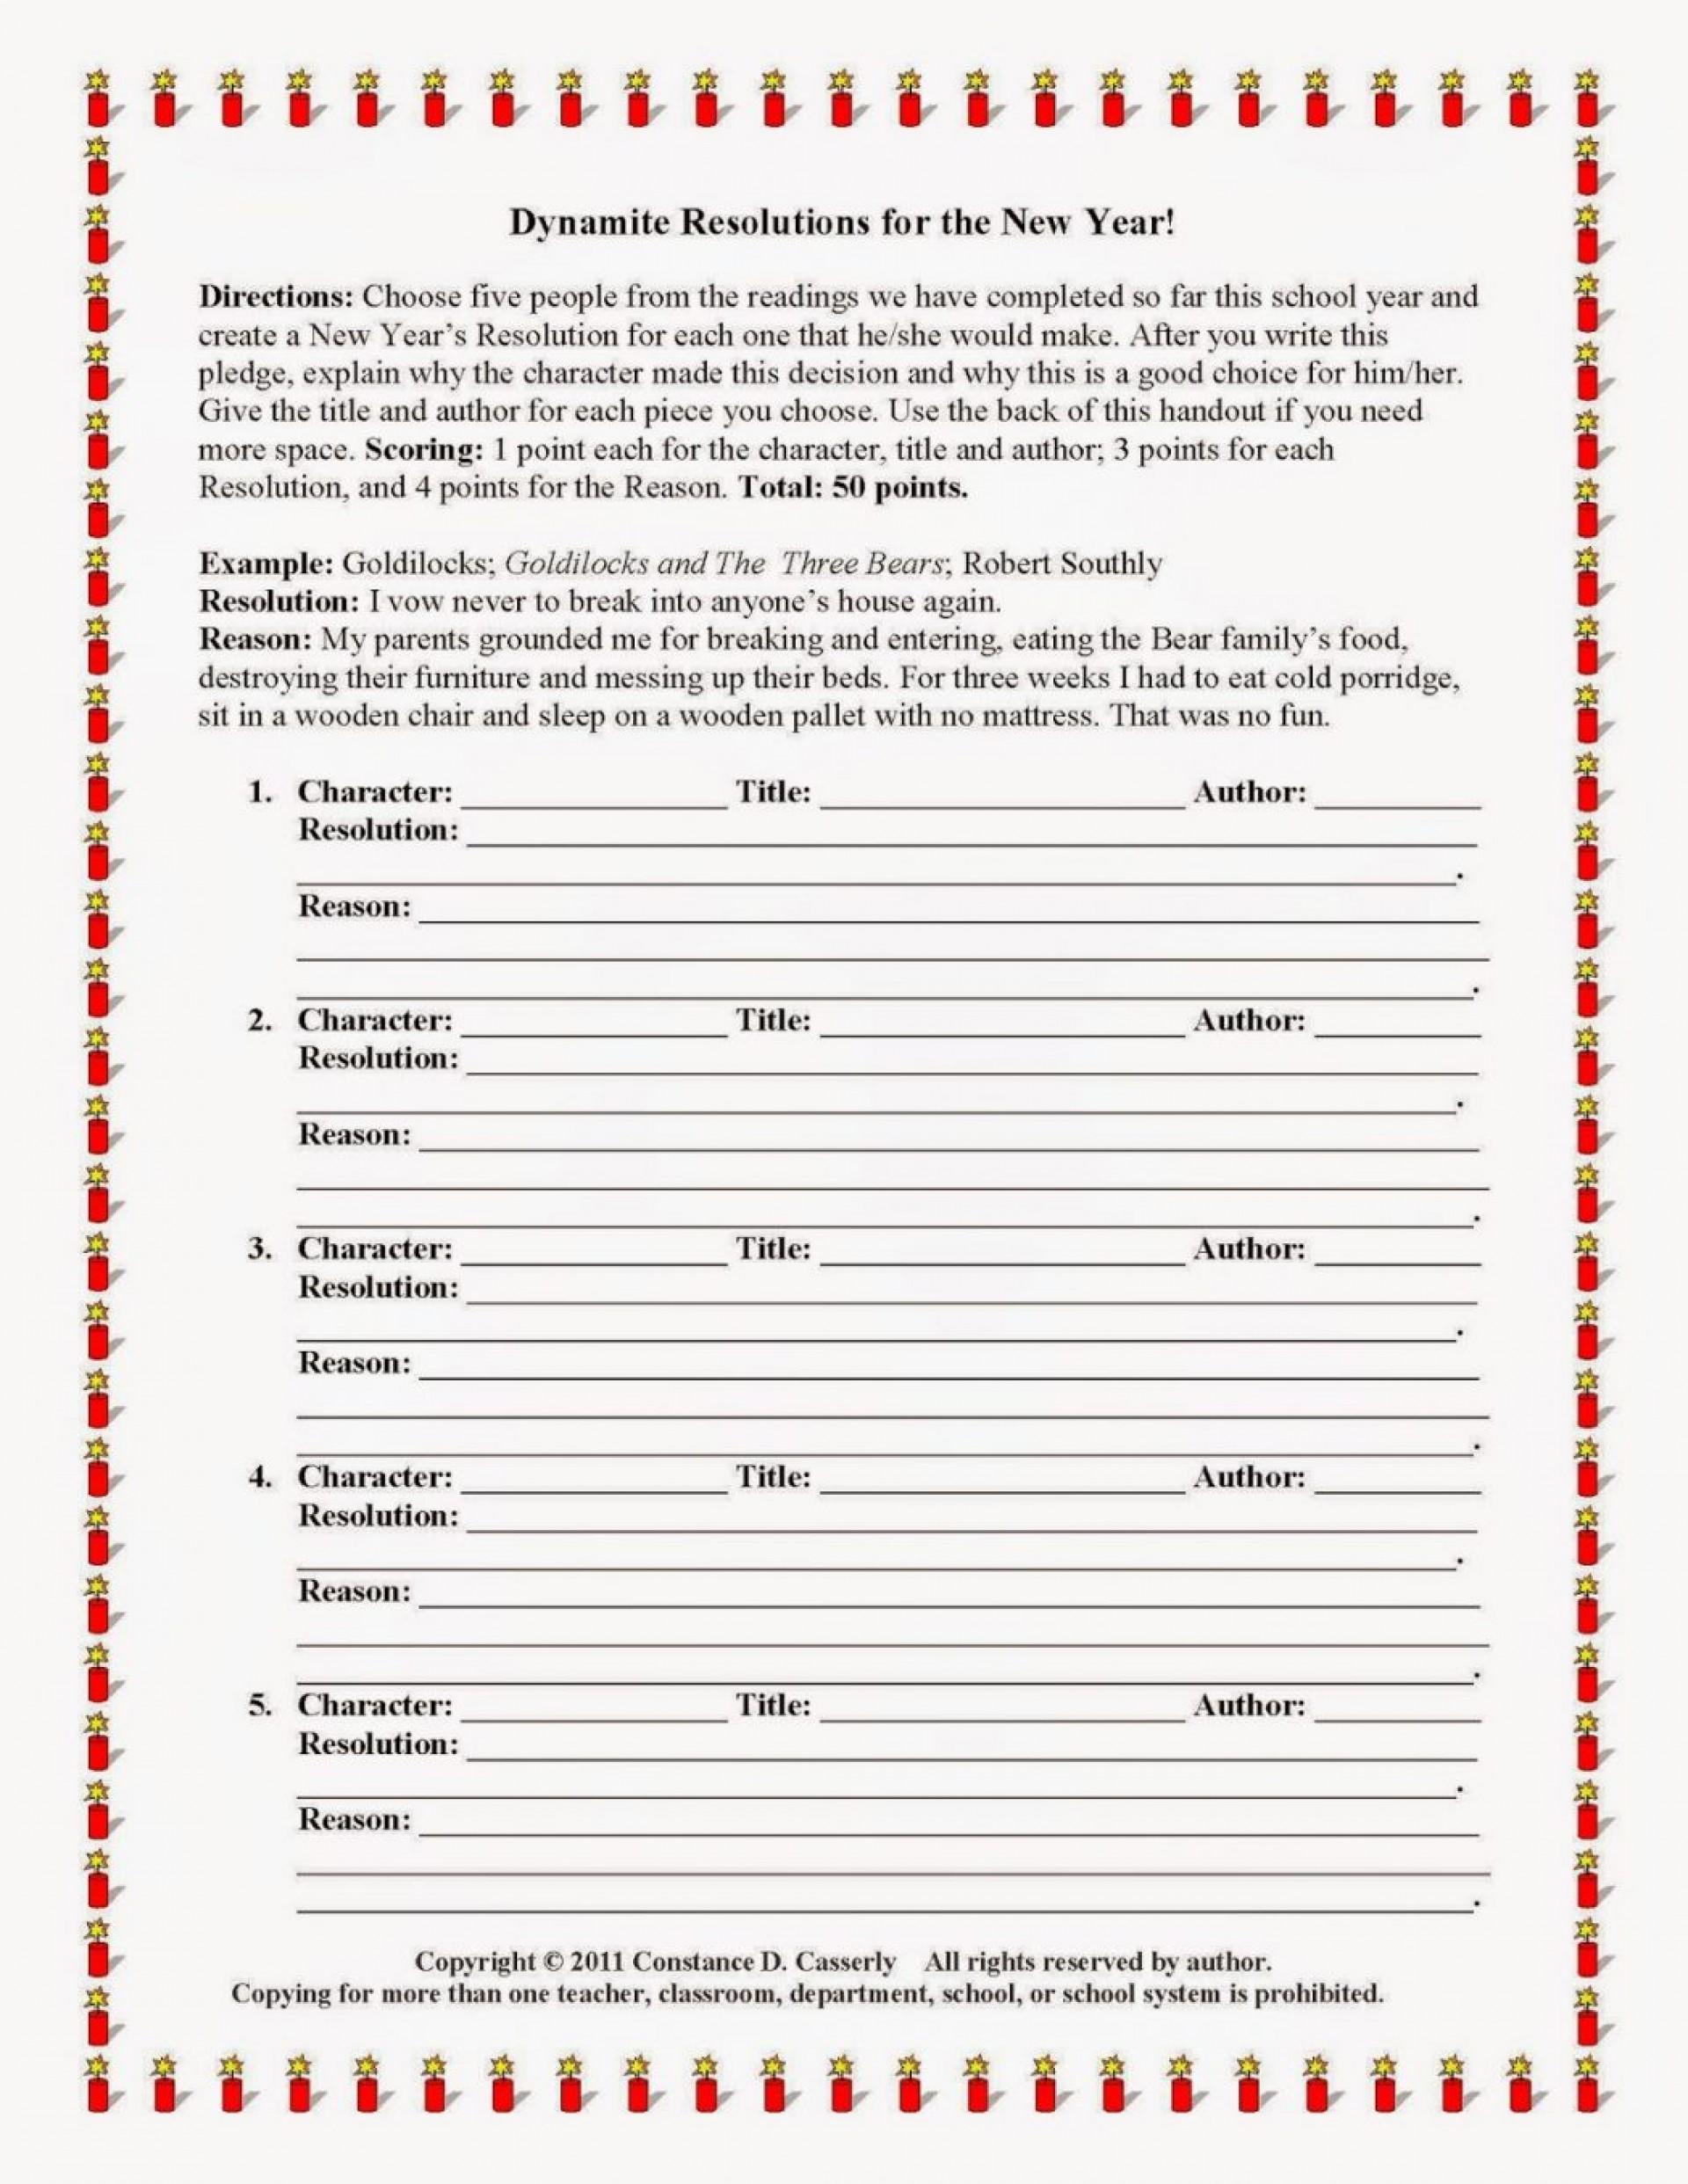 020 My New Year Resolution Essay Example On Grammar Write An Happy Activitydynamiteresolutionsforthenewyearwhitebackg Singular High School Student 2019 For Class 5 1920